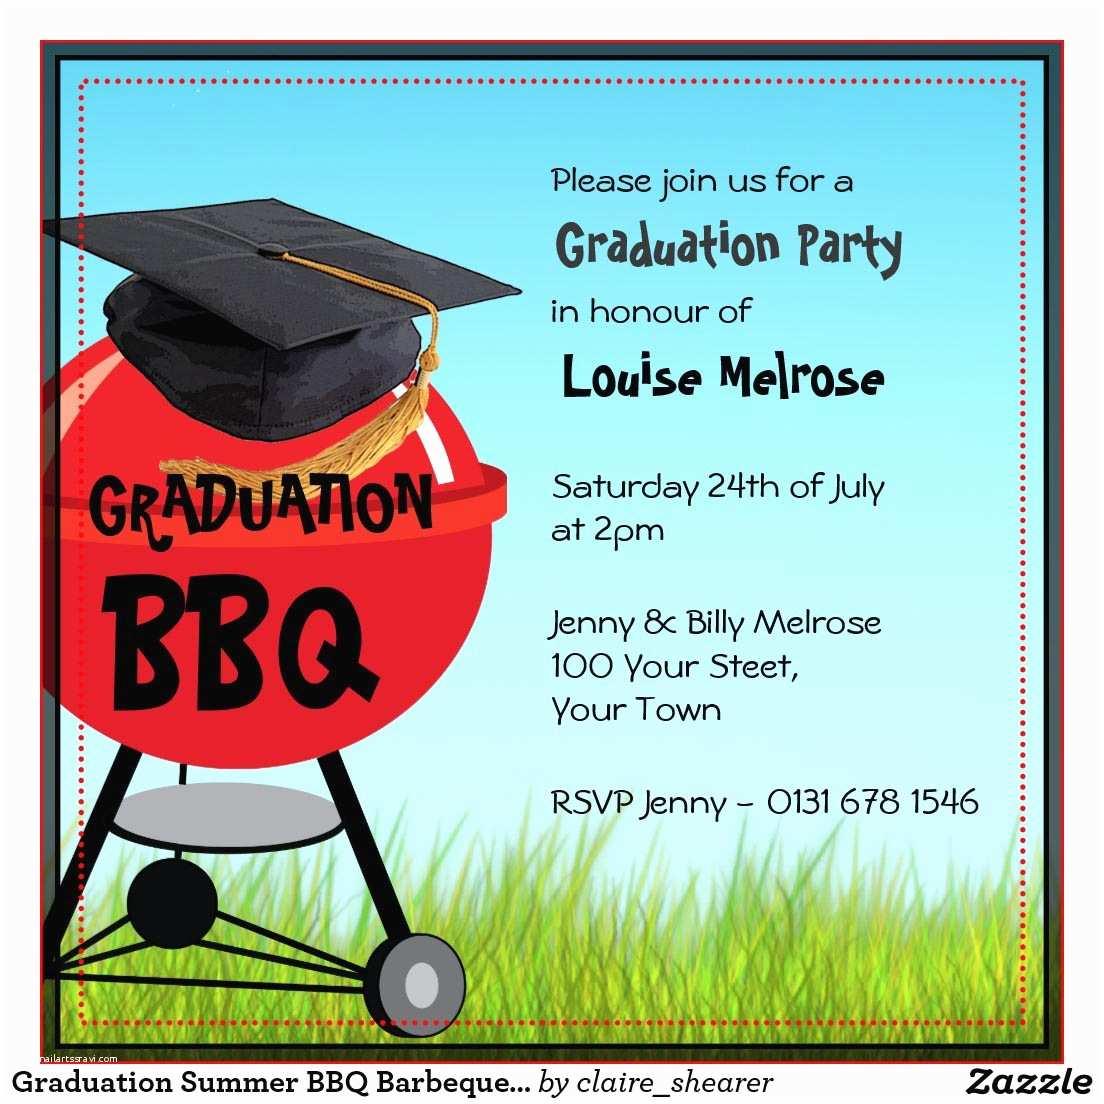 Graduation Party Invitations Ideas Evites Graduation Party